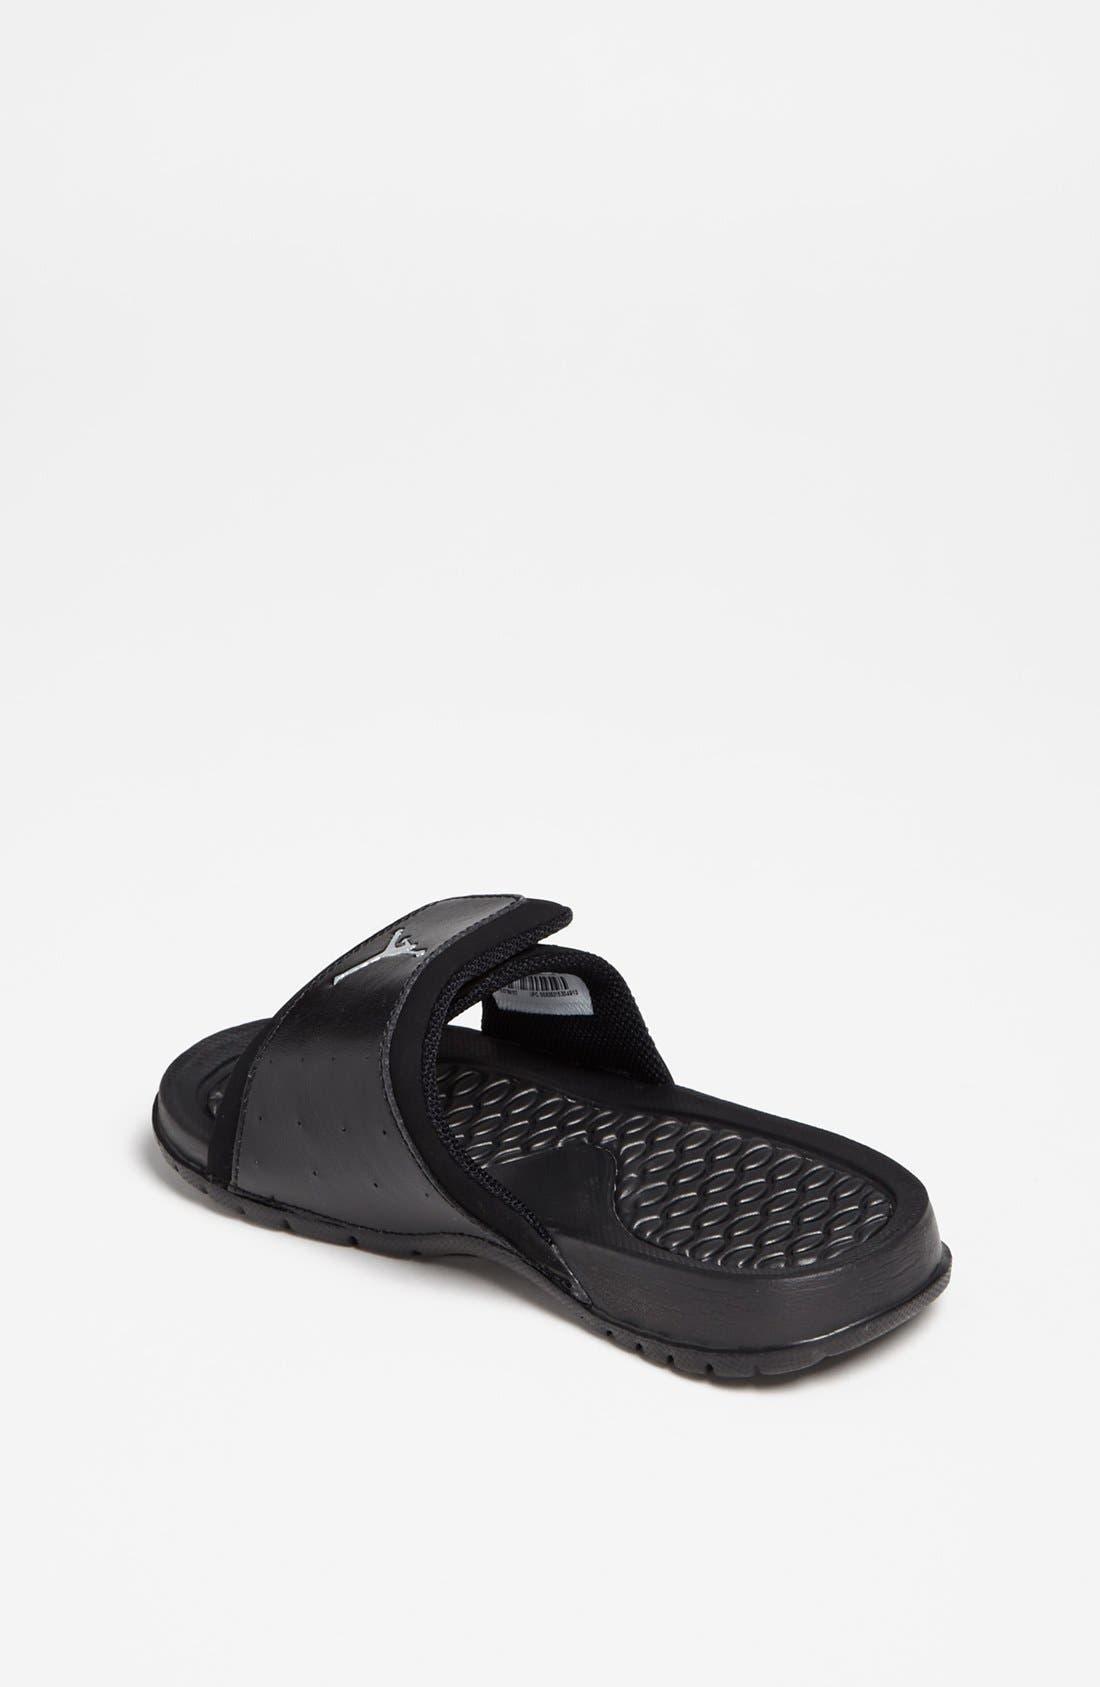 Alternate Image 2  - Nike 'Jordan Hydro II' Sandal (Toddler & Little Kid)